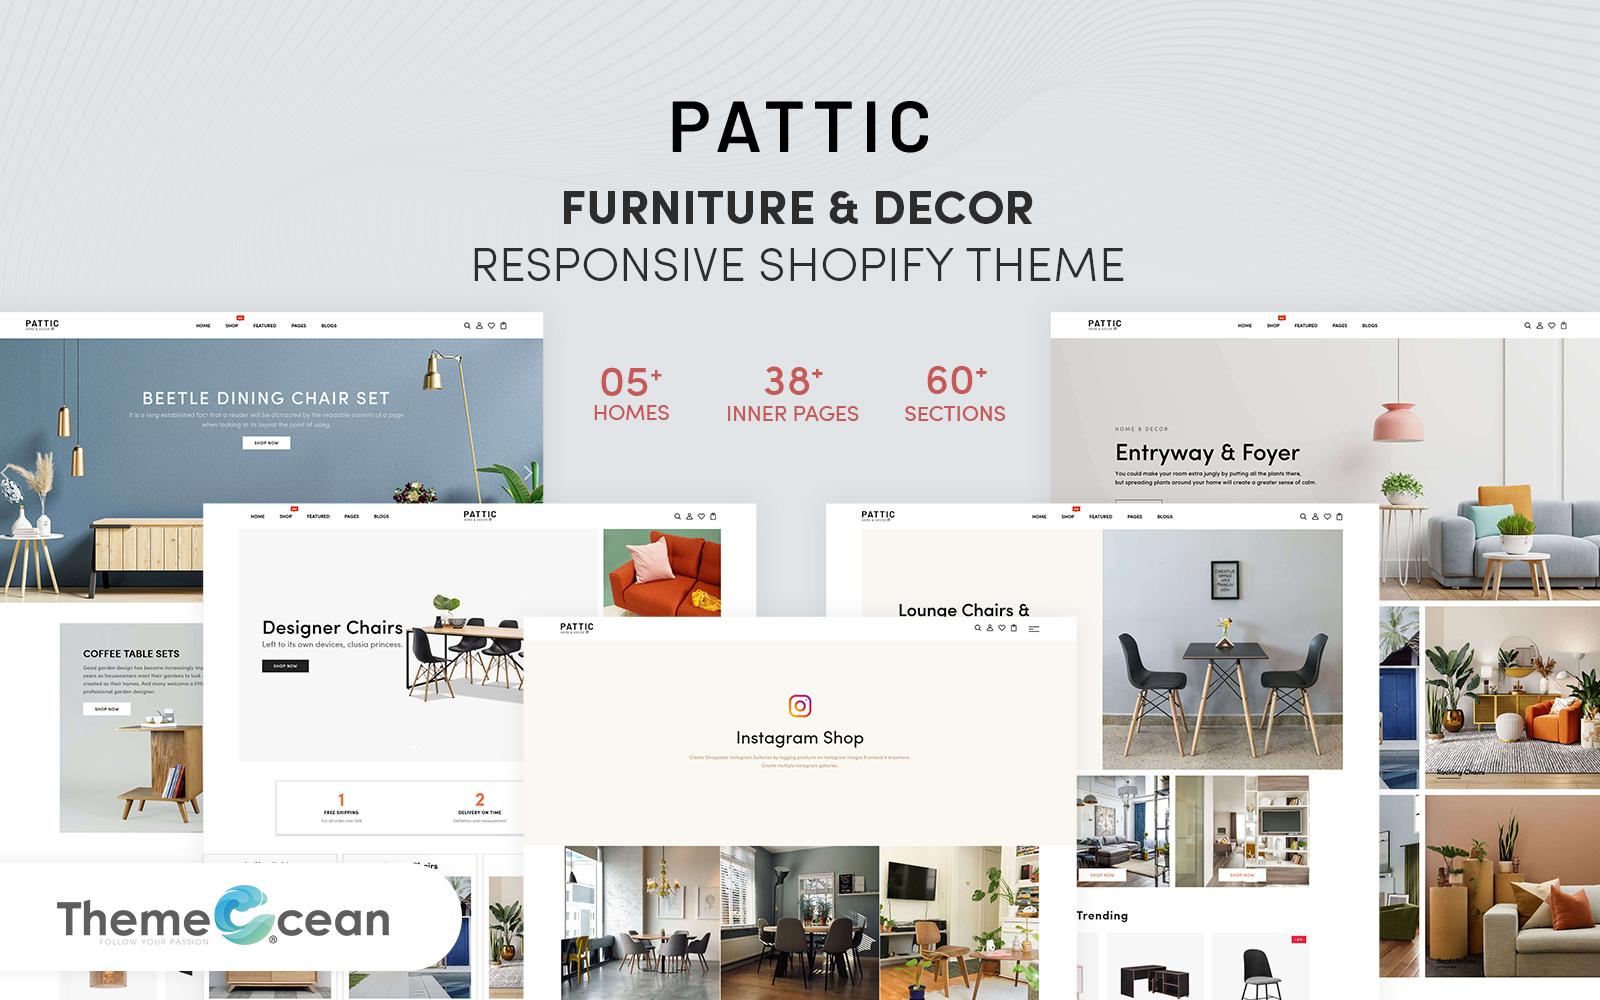 Pattic - Furniture & Decor Responsive Shopify Theme